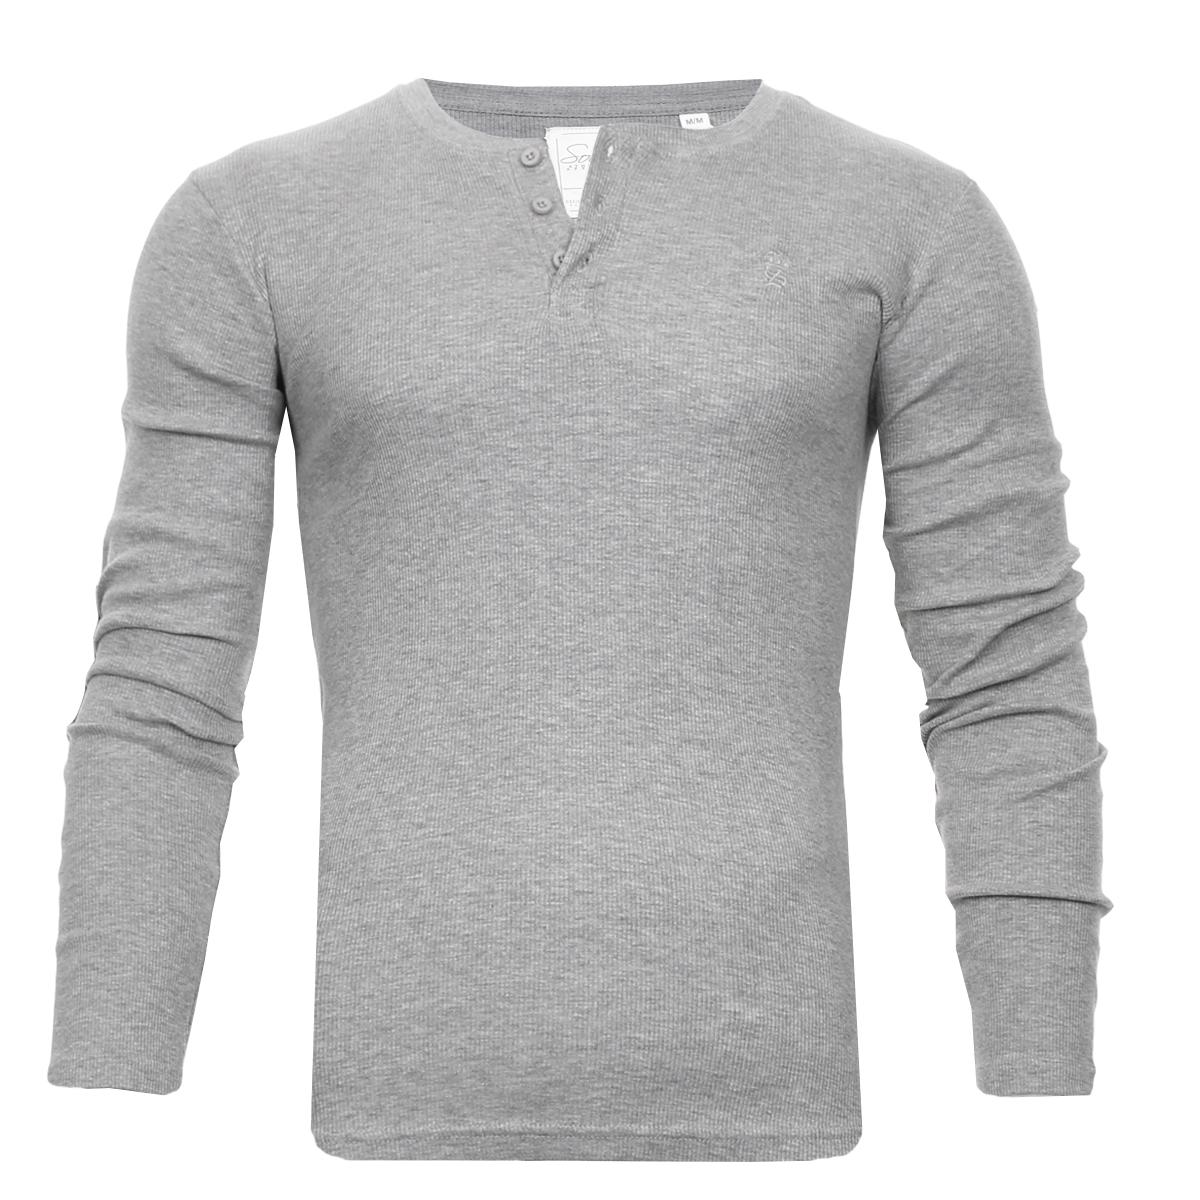 Men-Grandad-T-Shirt-Long-Sleeve-Jersey-Ribbed-Top-Cotton-Rich-Brave-Soul thumbnail 18